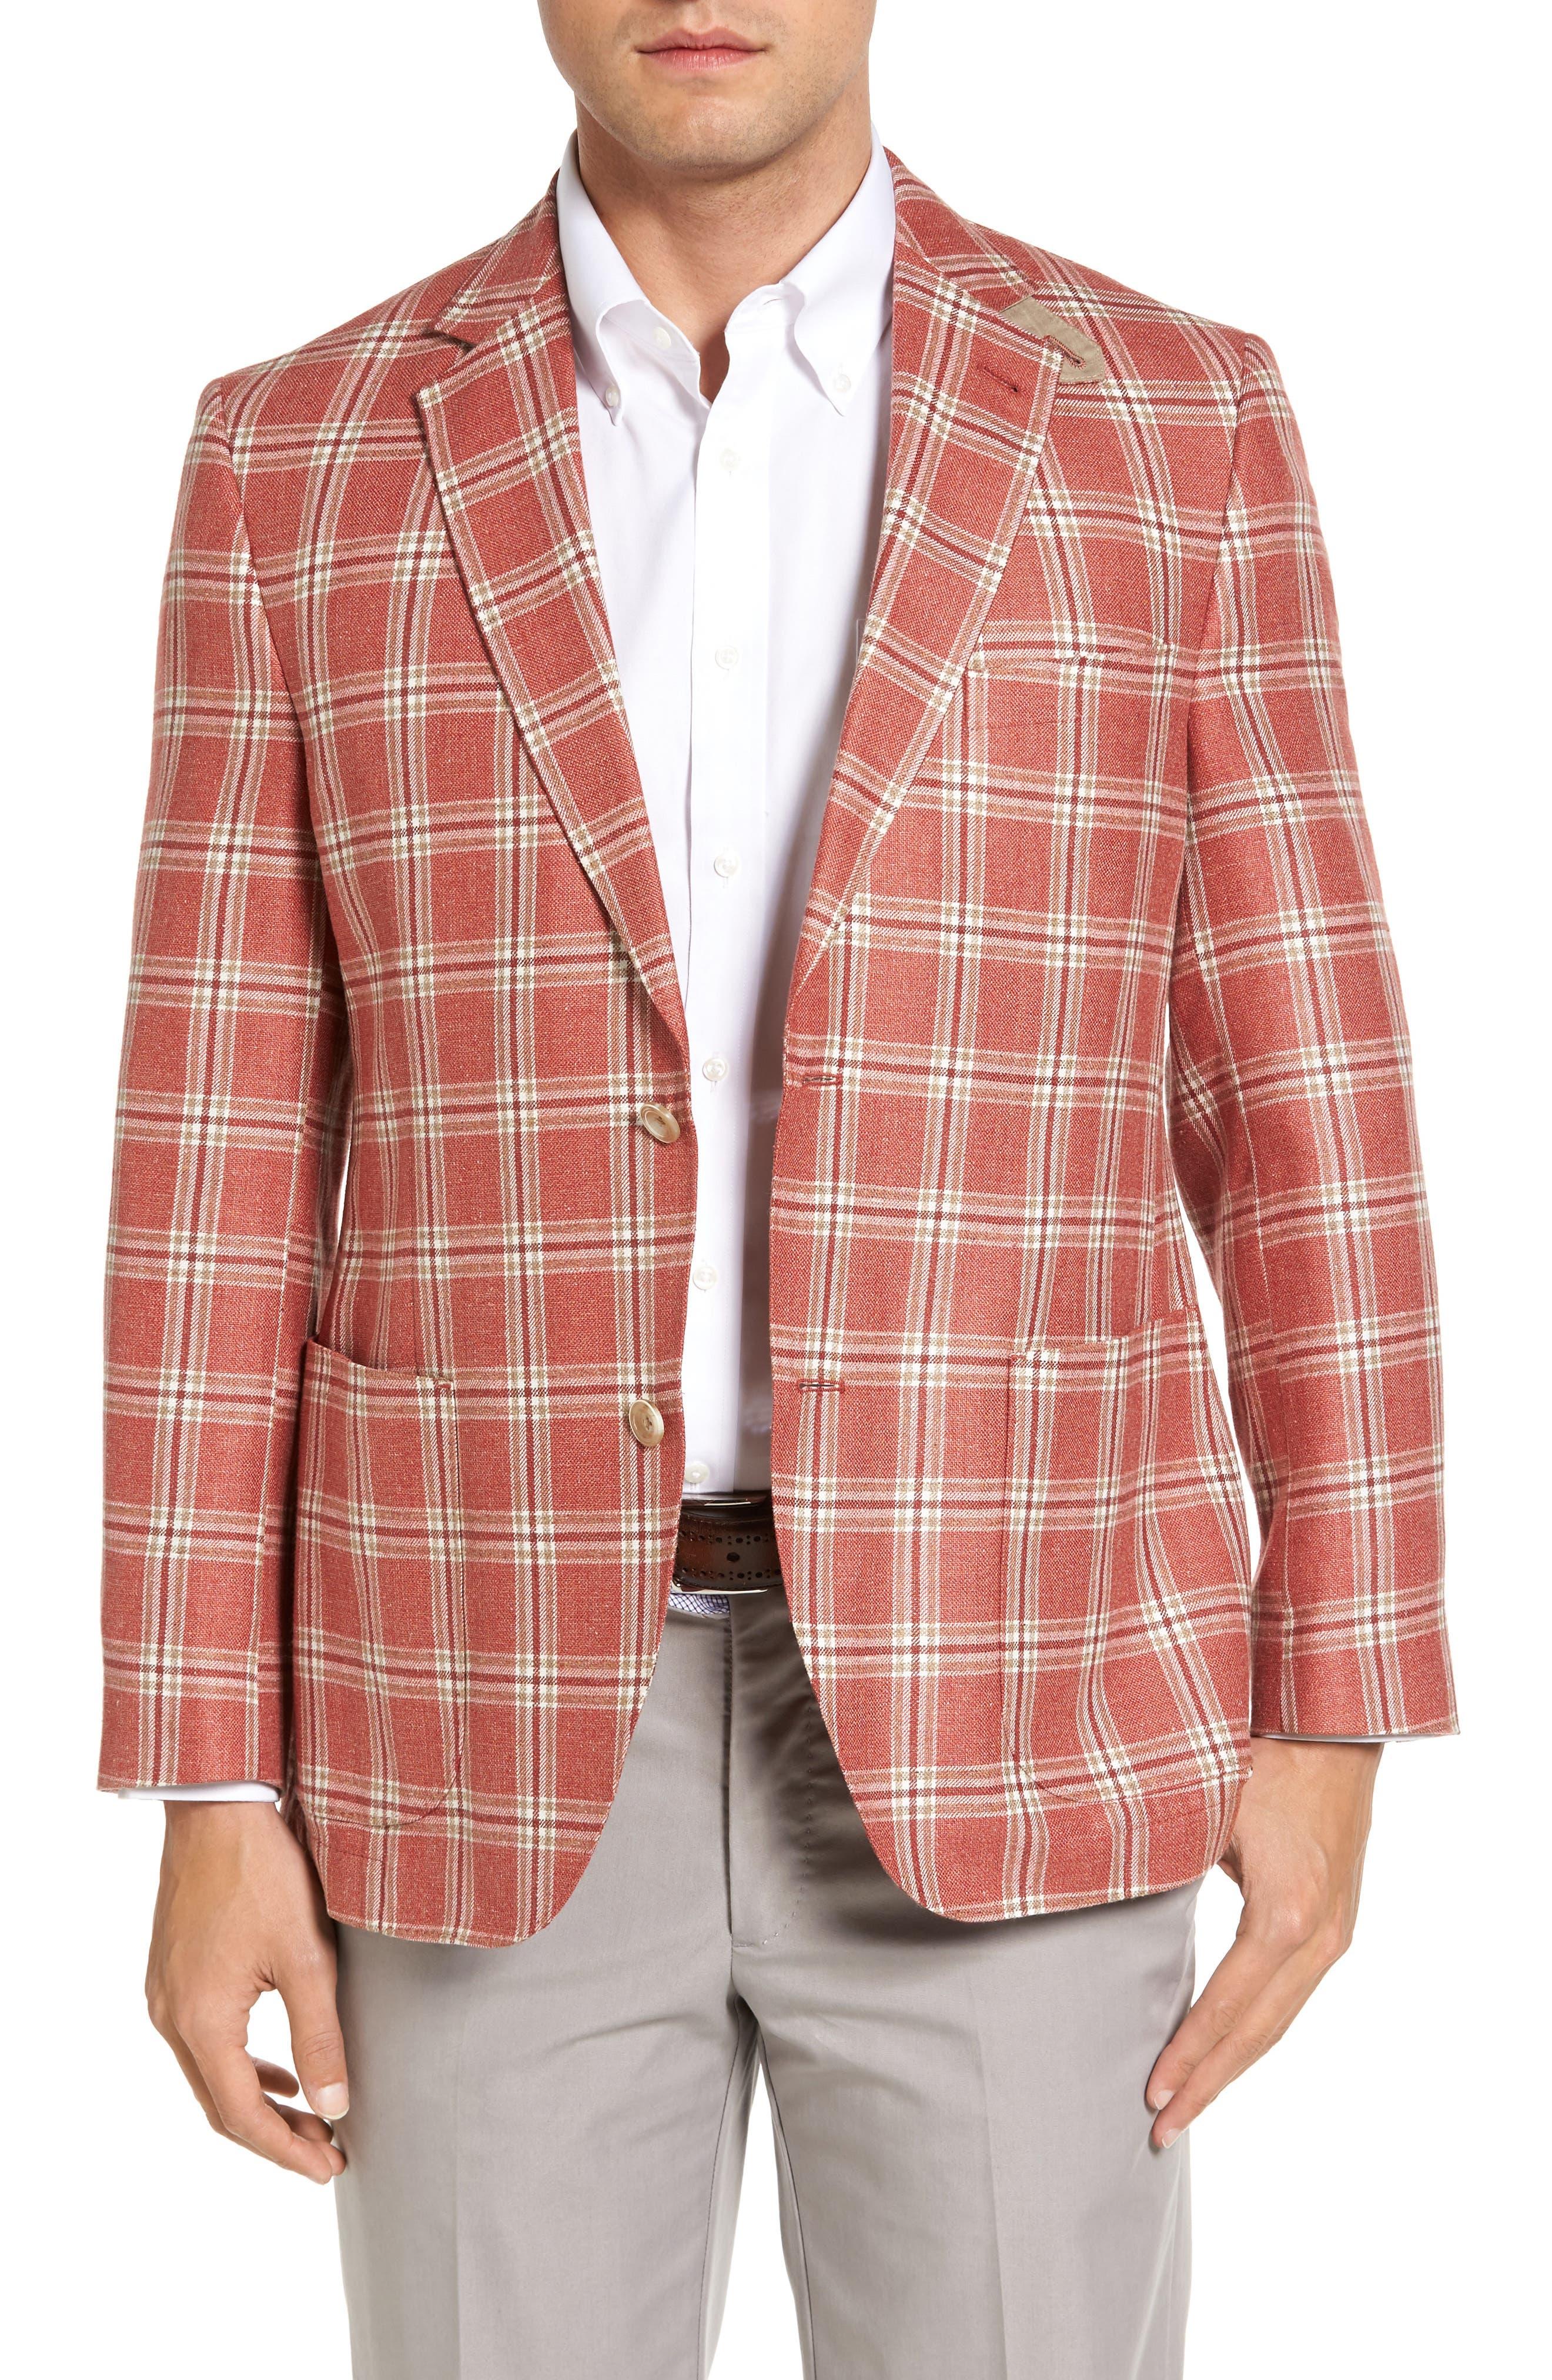 Main Image - Kroon Bono 2 Classic Fit Plaid Silk Blend Sport Coat